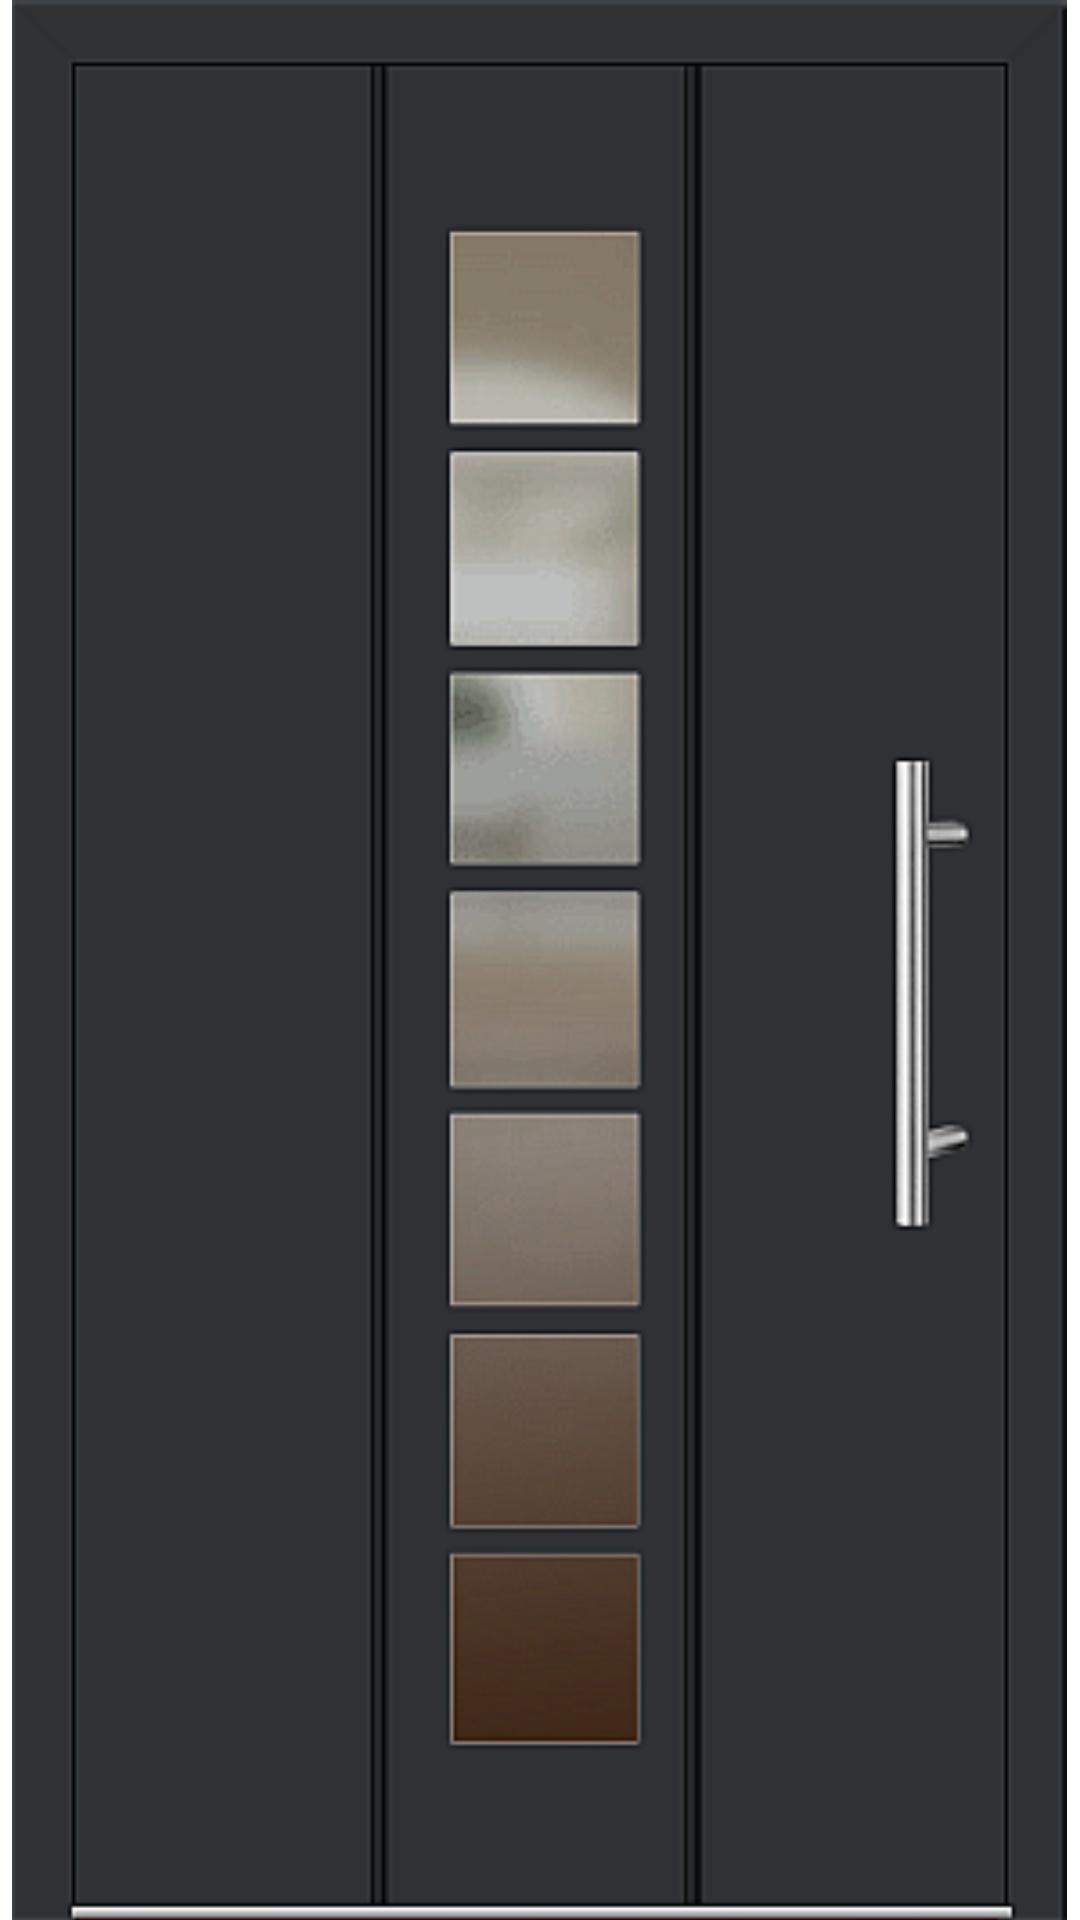 Aluminium Haustür Modell 6512-52 schwarz